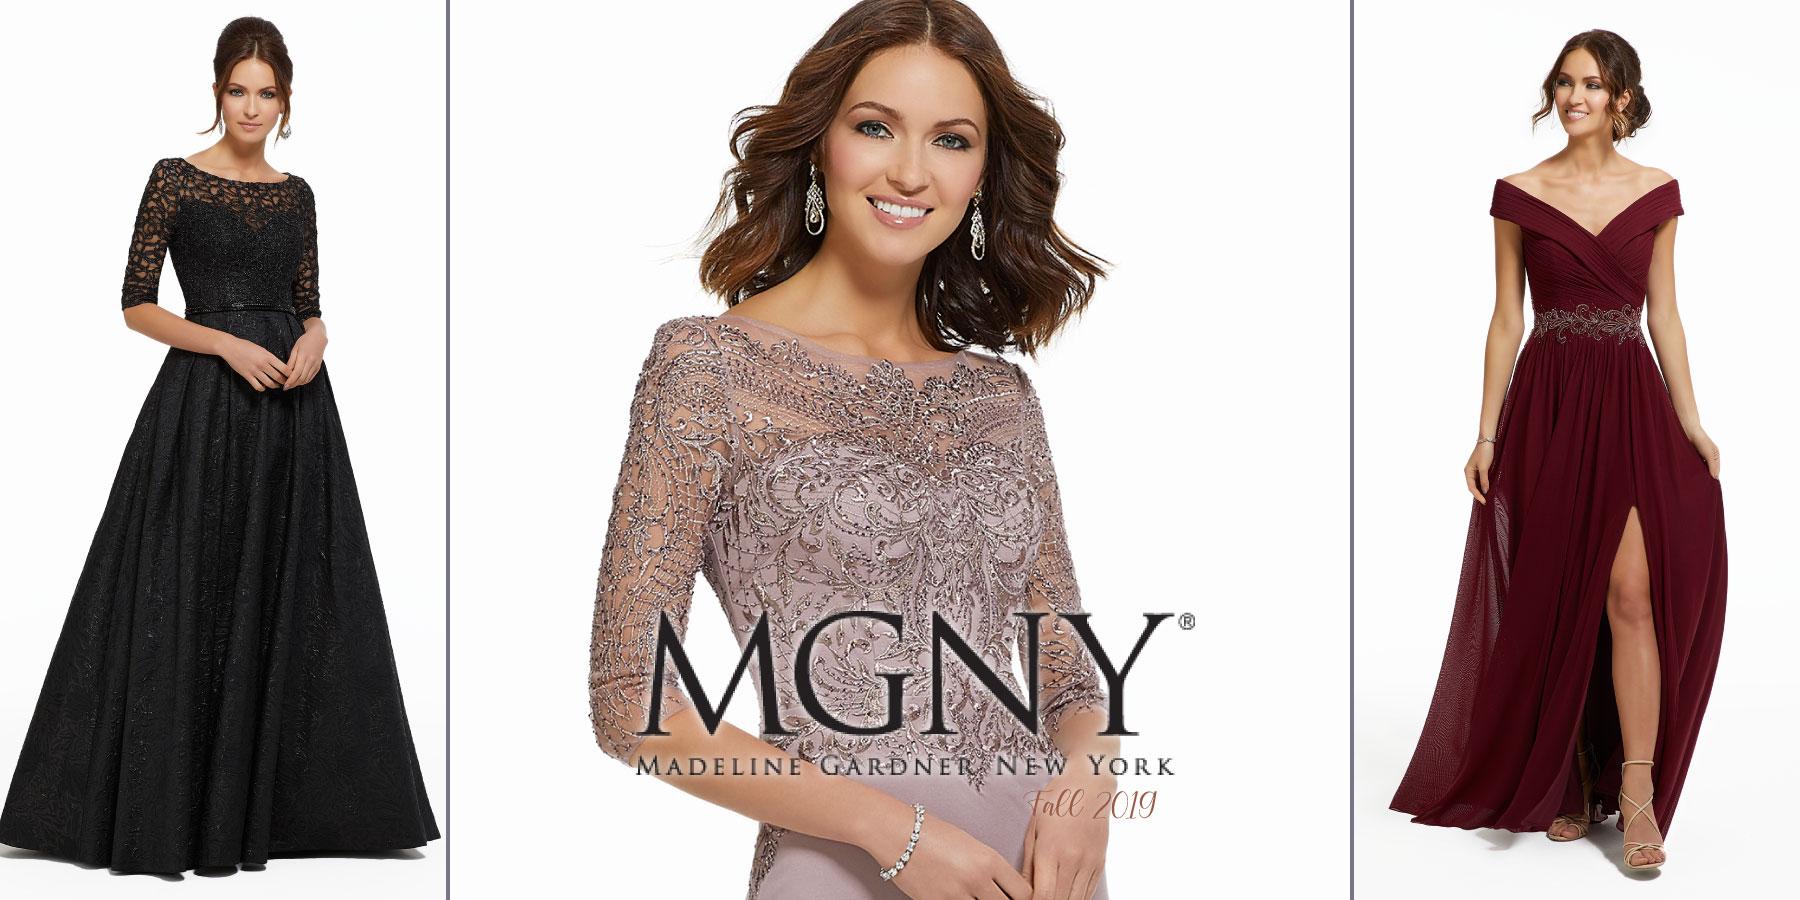 MGNY Madeline Gardner